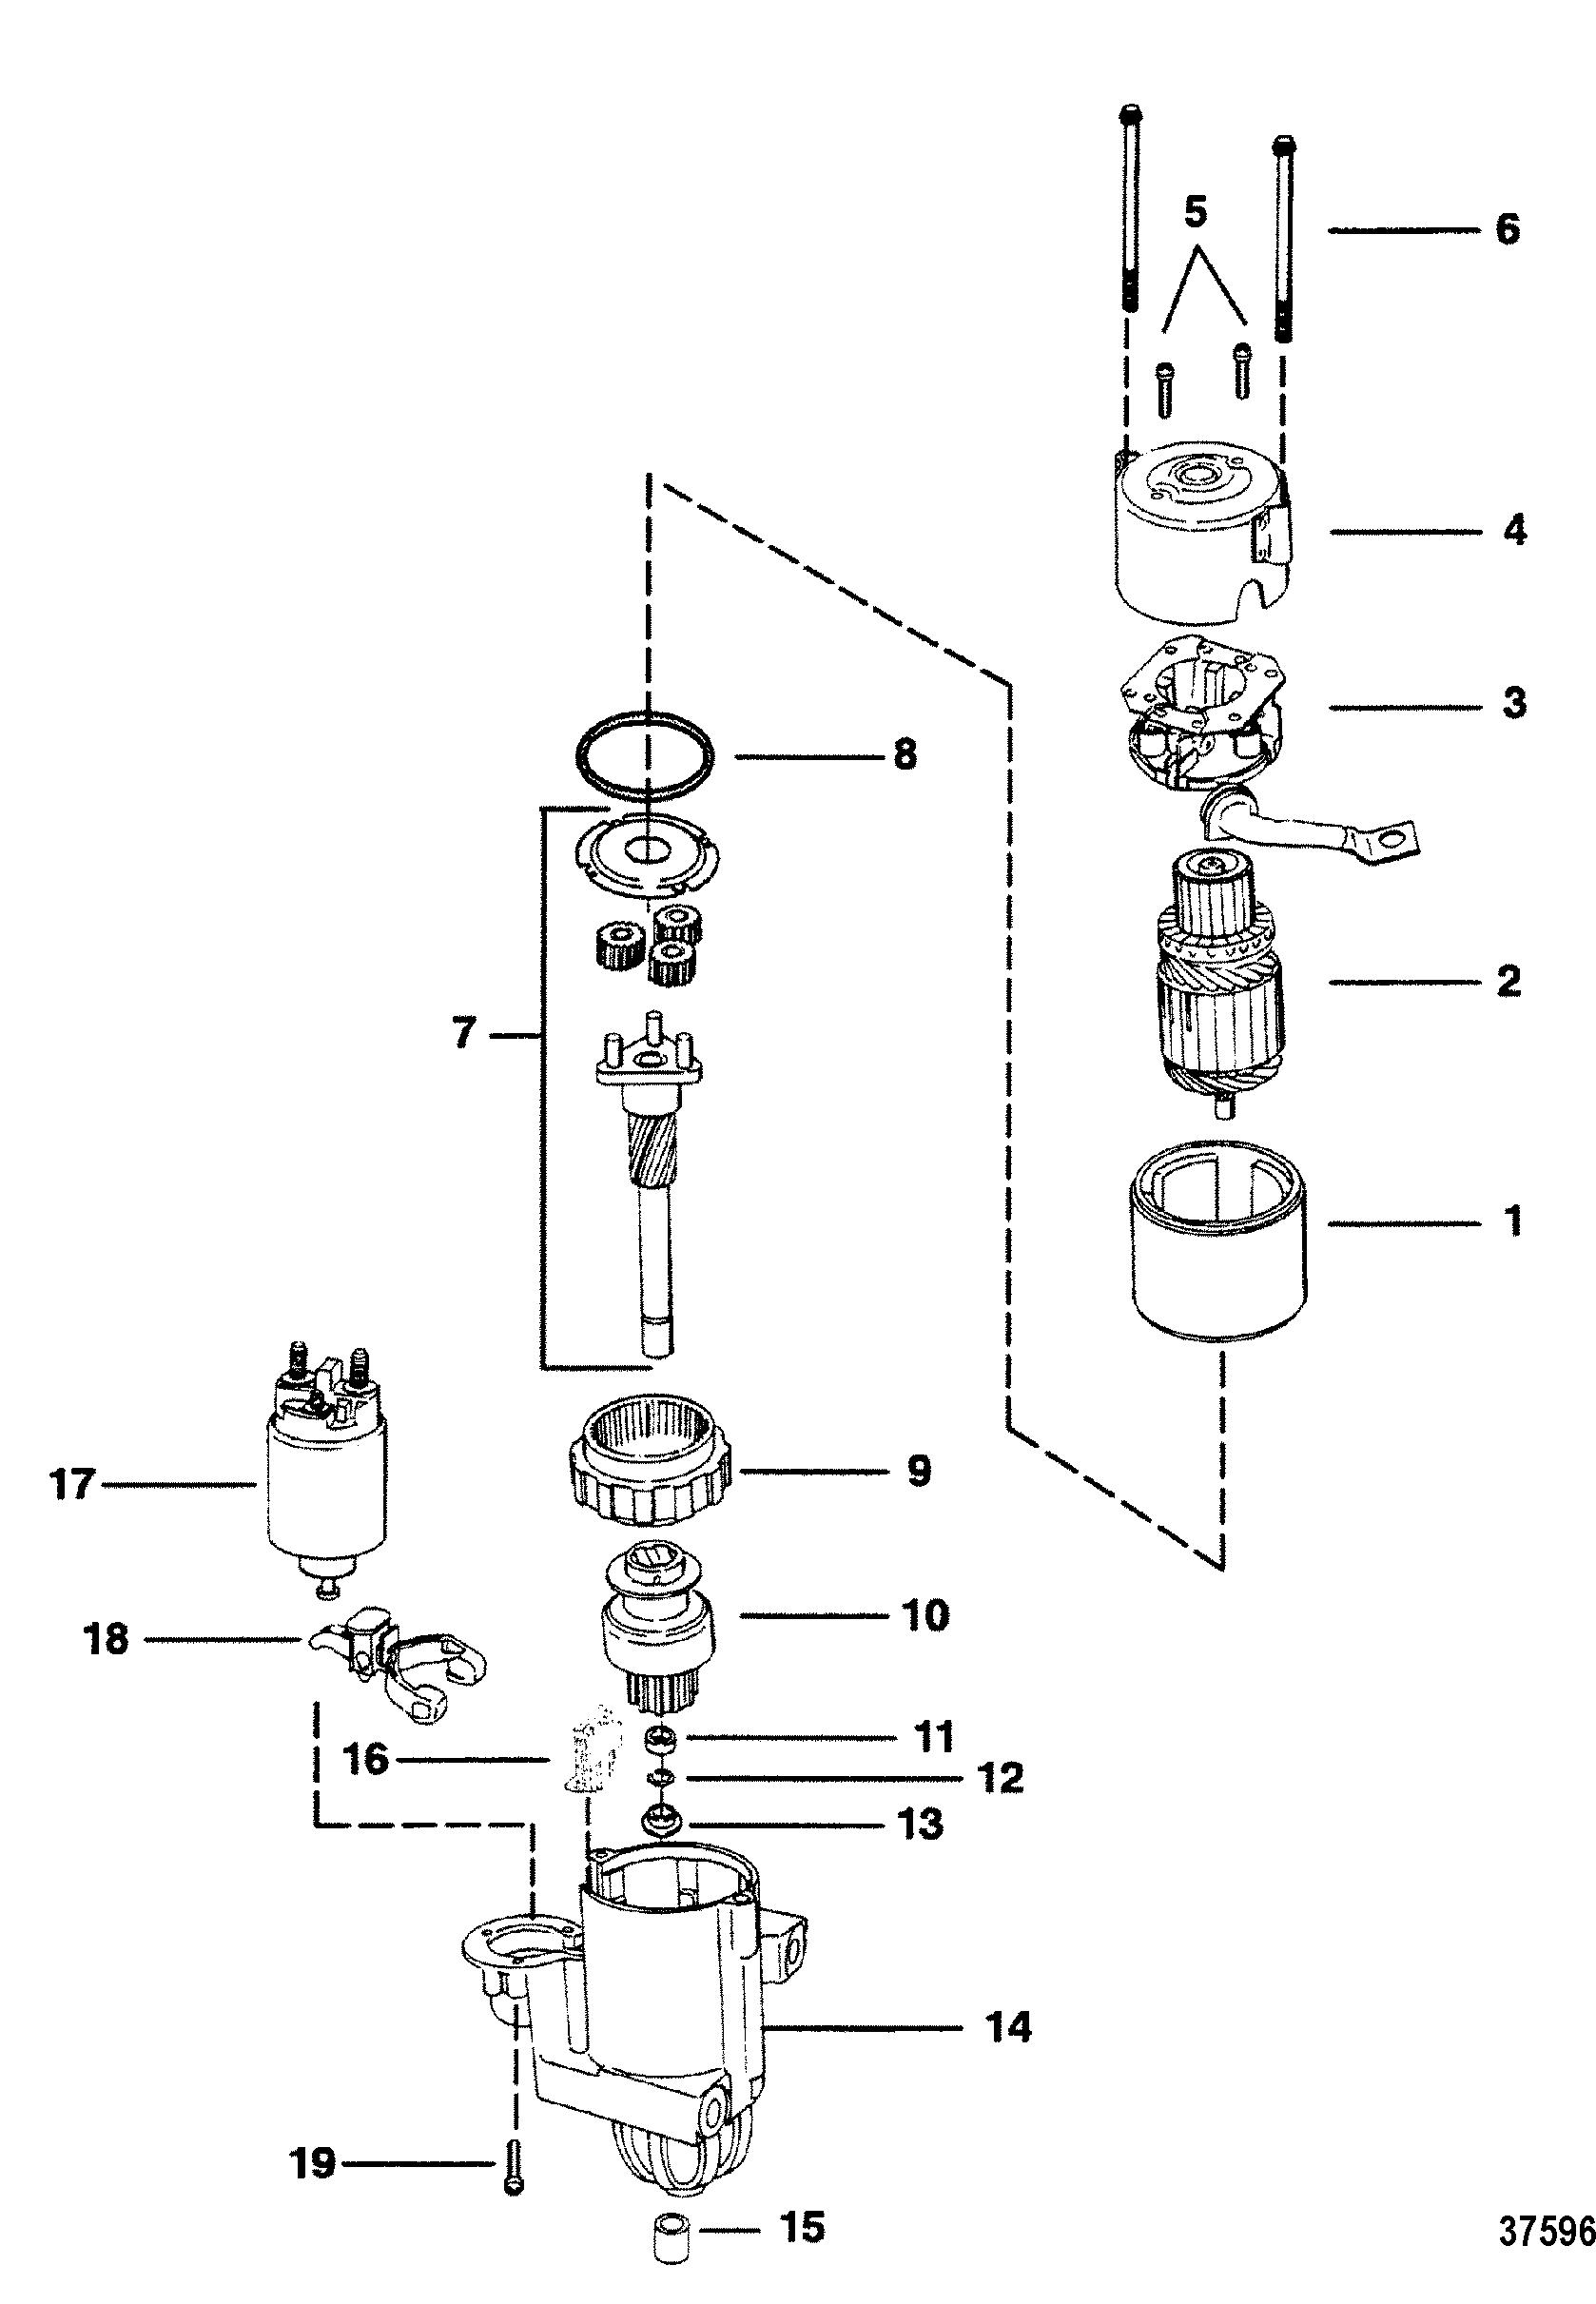 hight resolution of starter motor 8 pg 260 2 7 8 diameter end cap for mercruiser 4 3l 4 3lx alpha one engine 262 cid gen ii